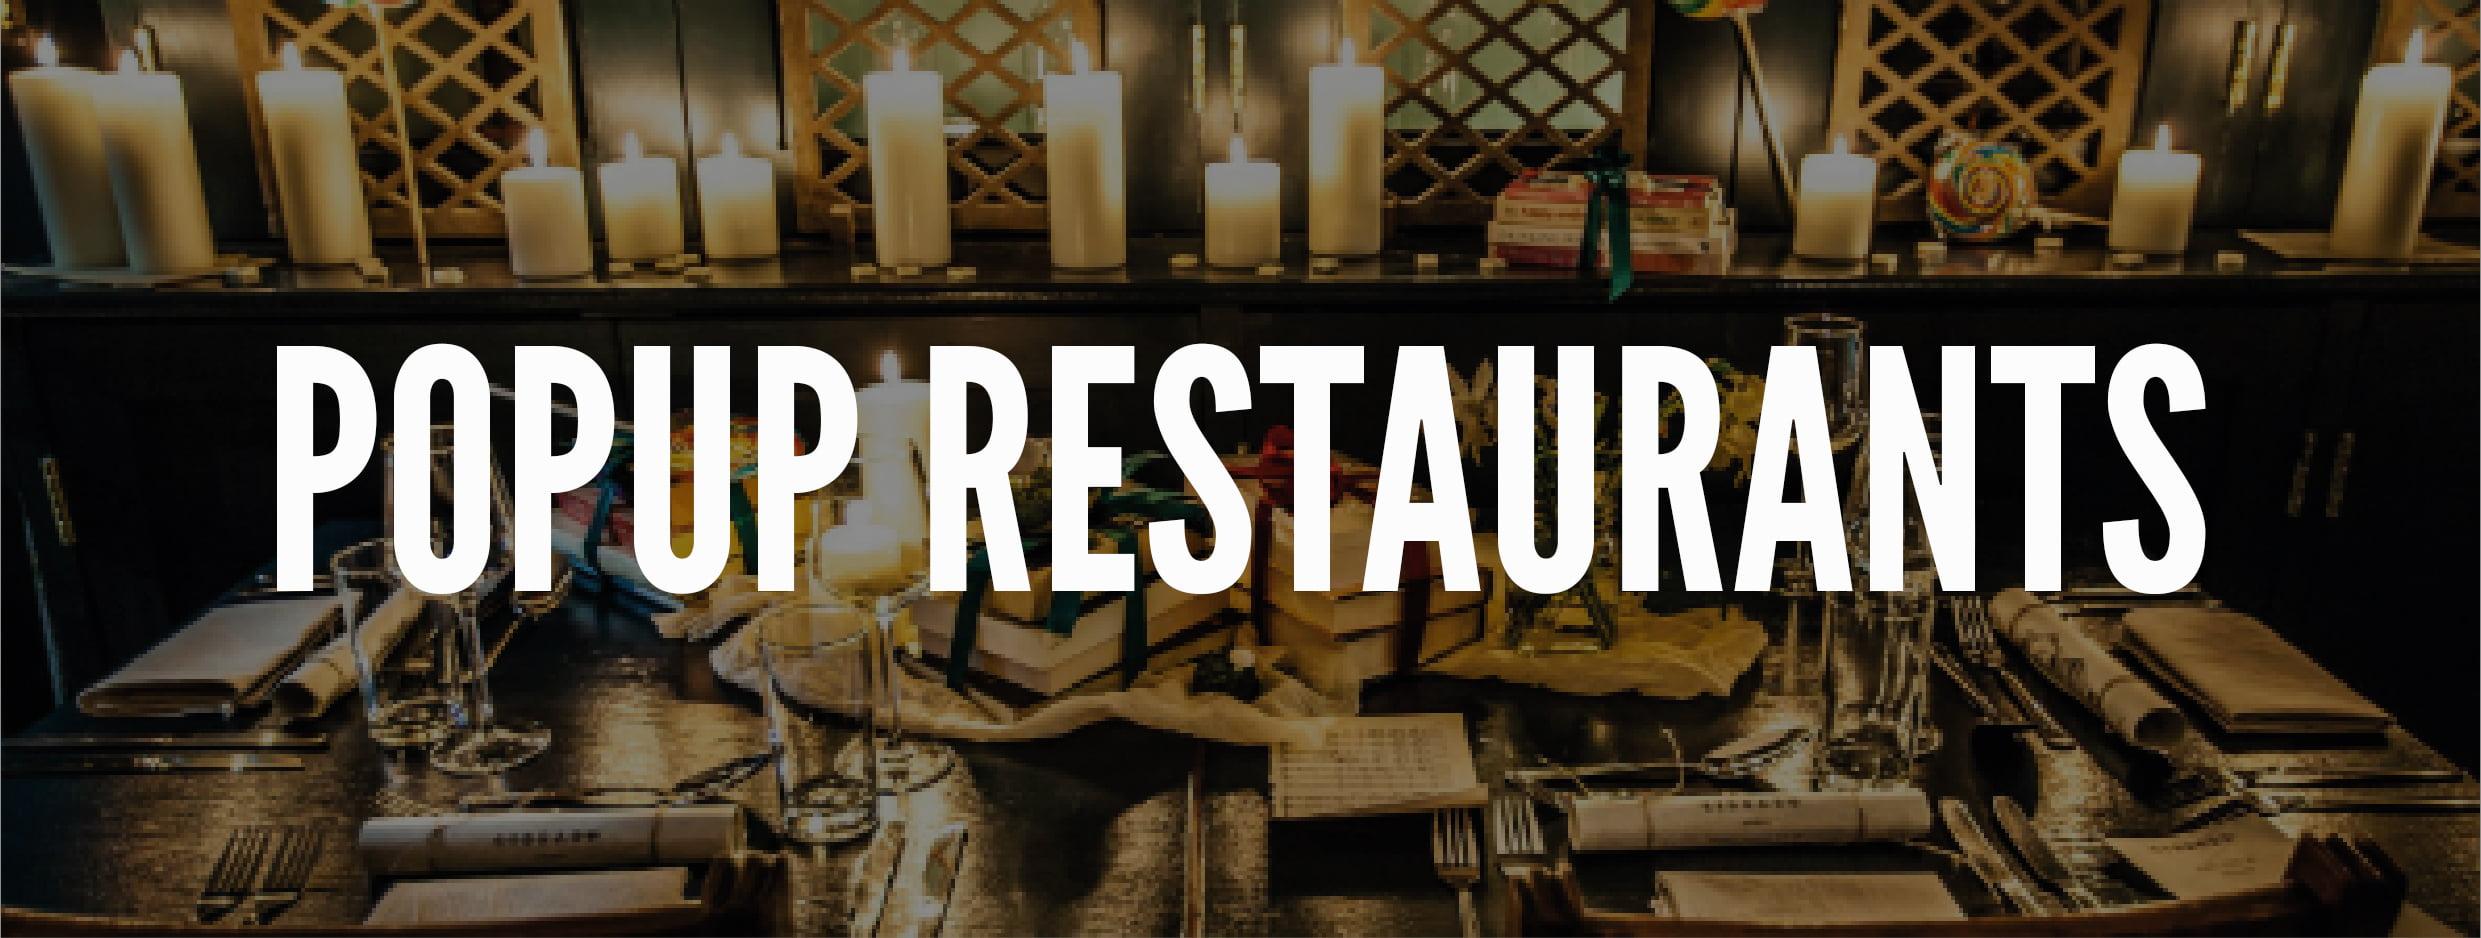 pop up restaurants in london november 2017 the nudge agenda